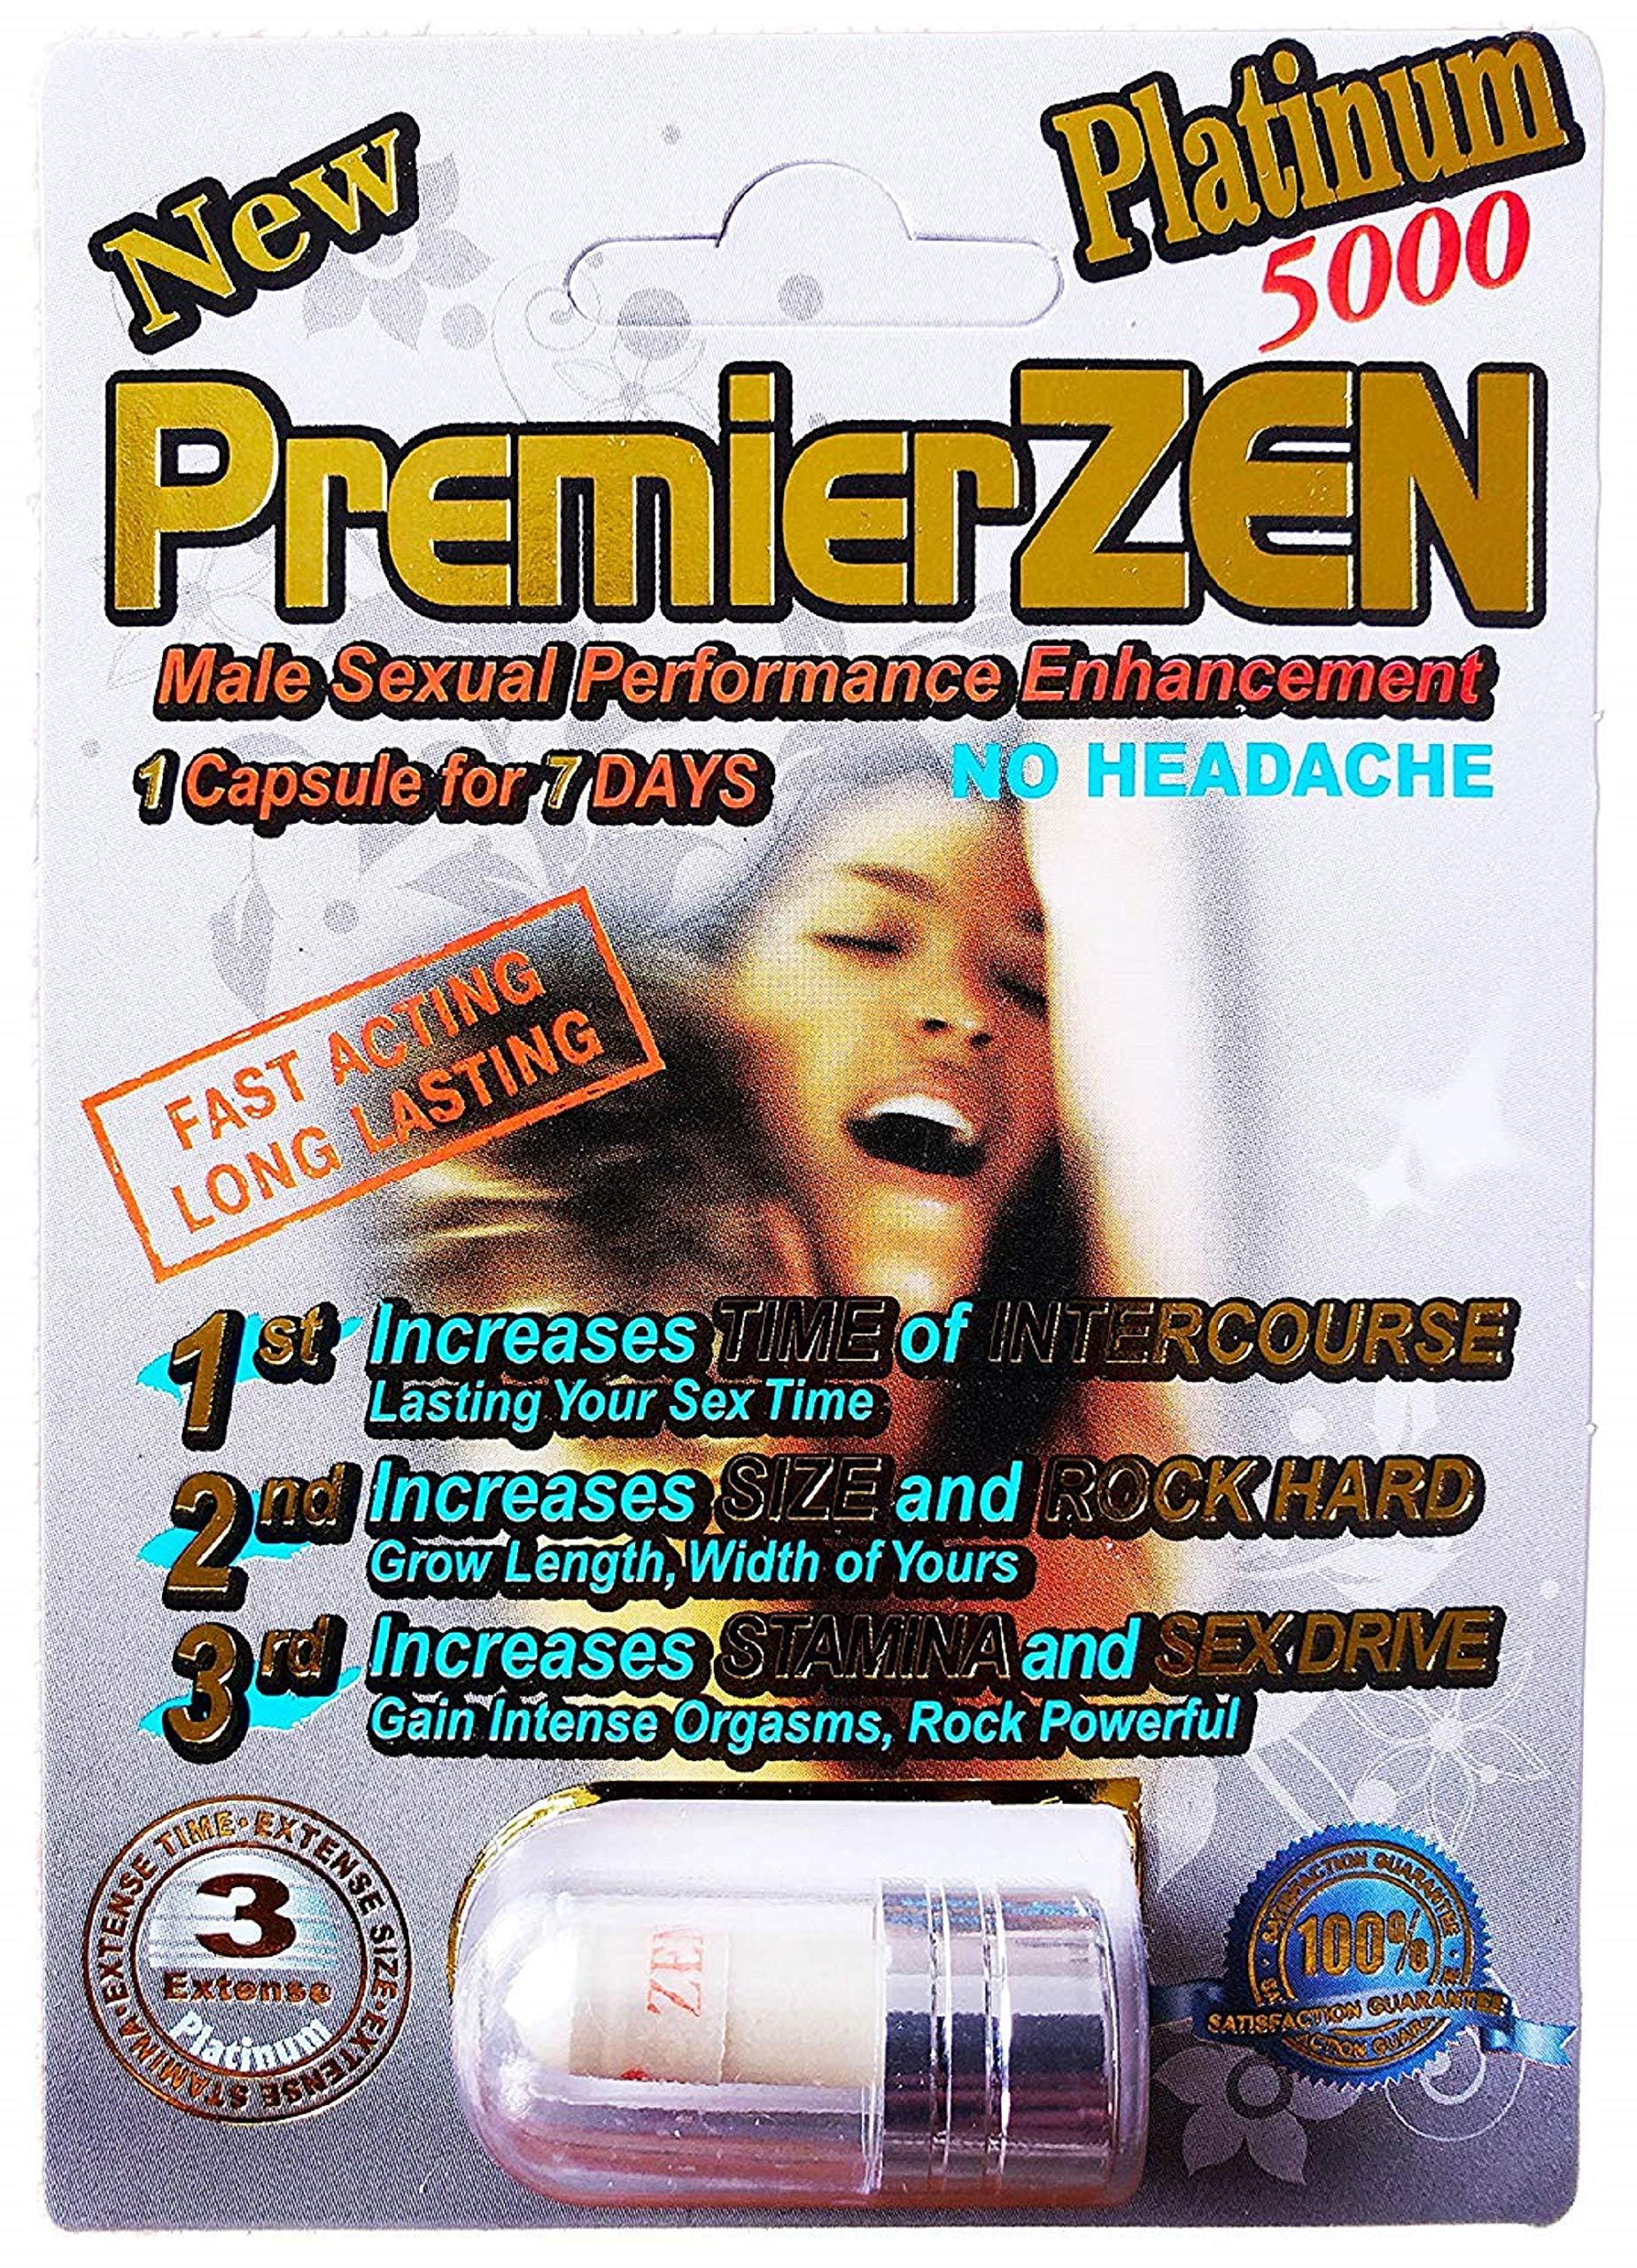 PremierZen Platinum 5000 Sexual Performance Enhancer [Bundle 6 Pills + 'Double Outlet' Gift] (6 Silver + Gift)